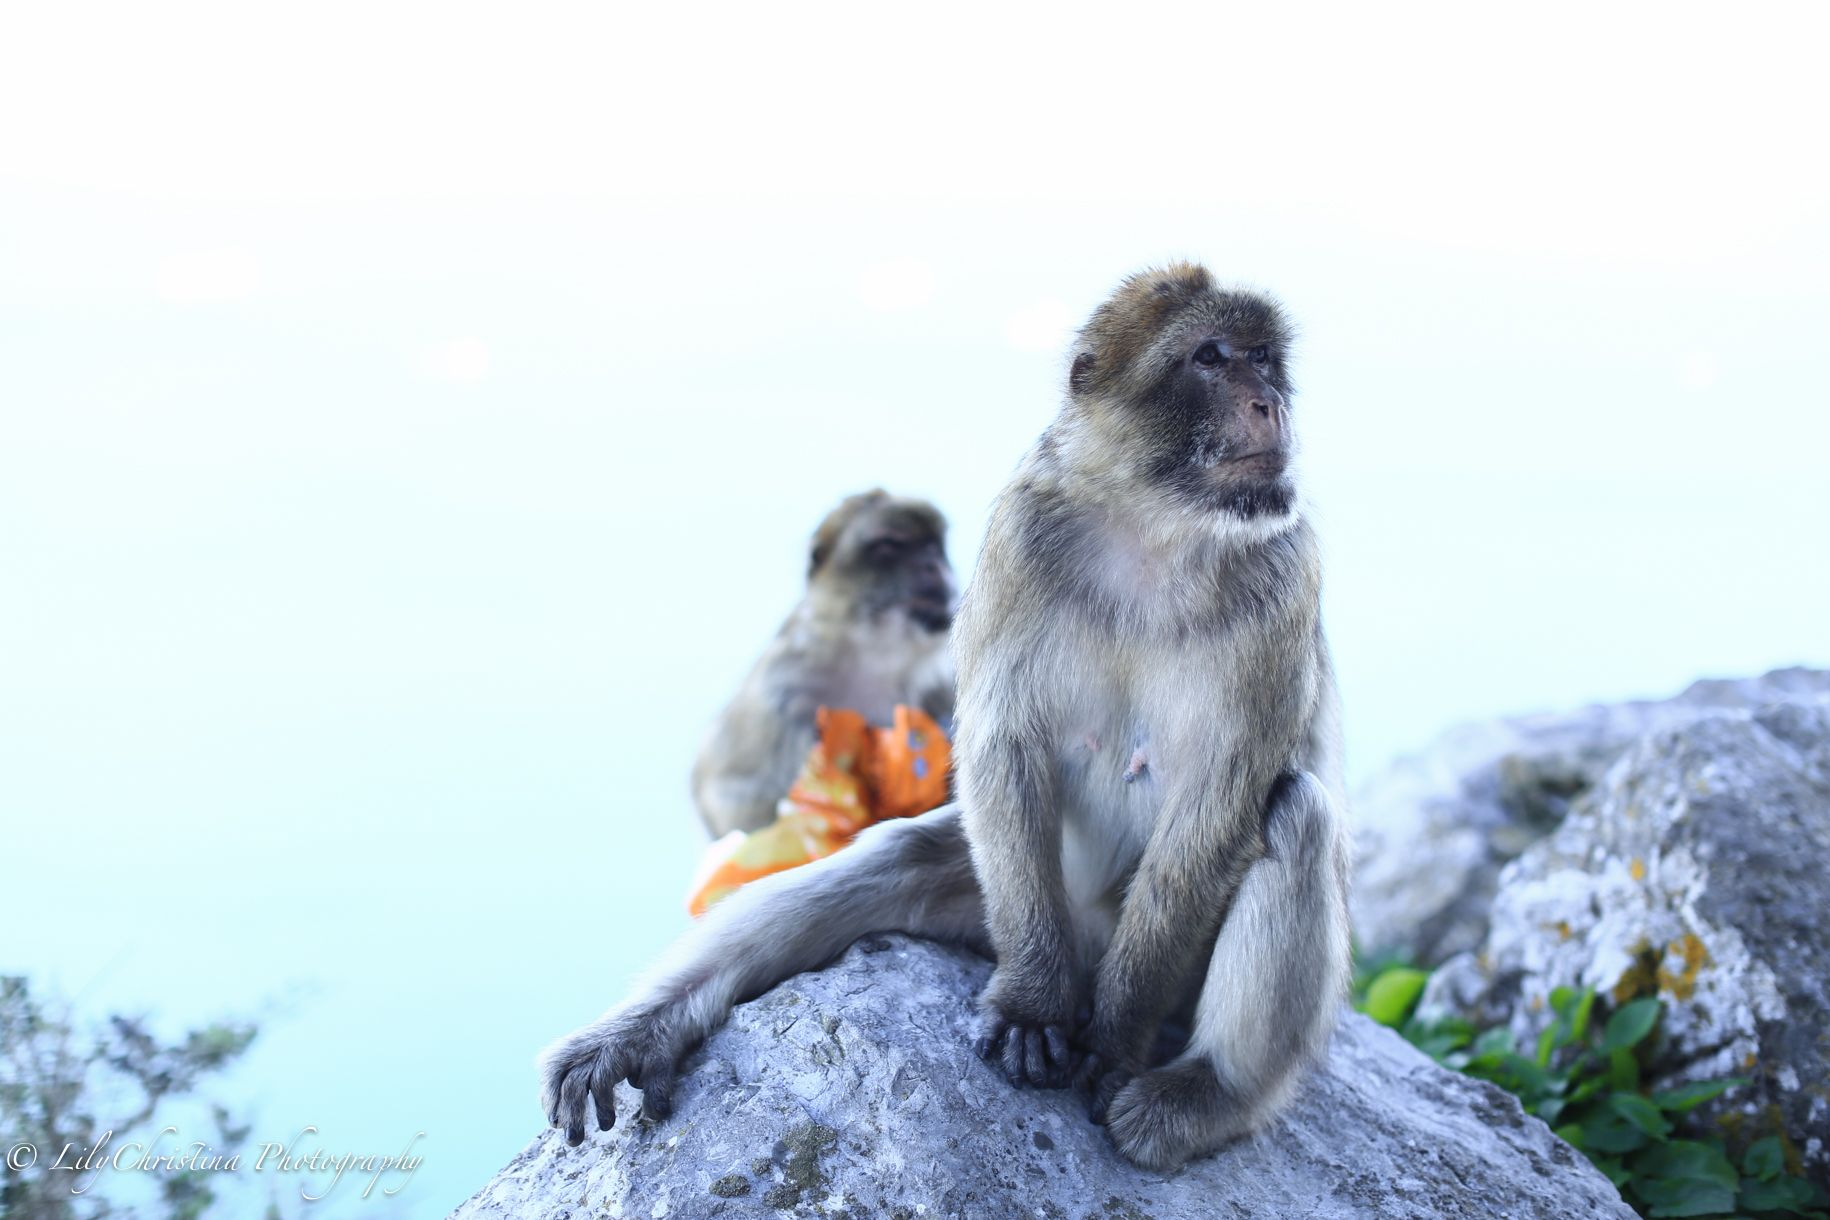 Gibraltar Monkies Gibraltar Monkies Apina Apinat Reissut Apina